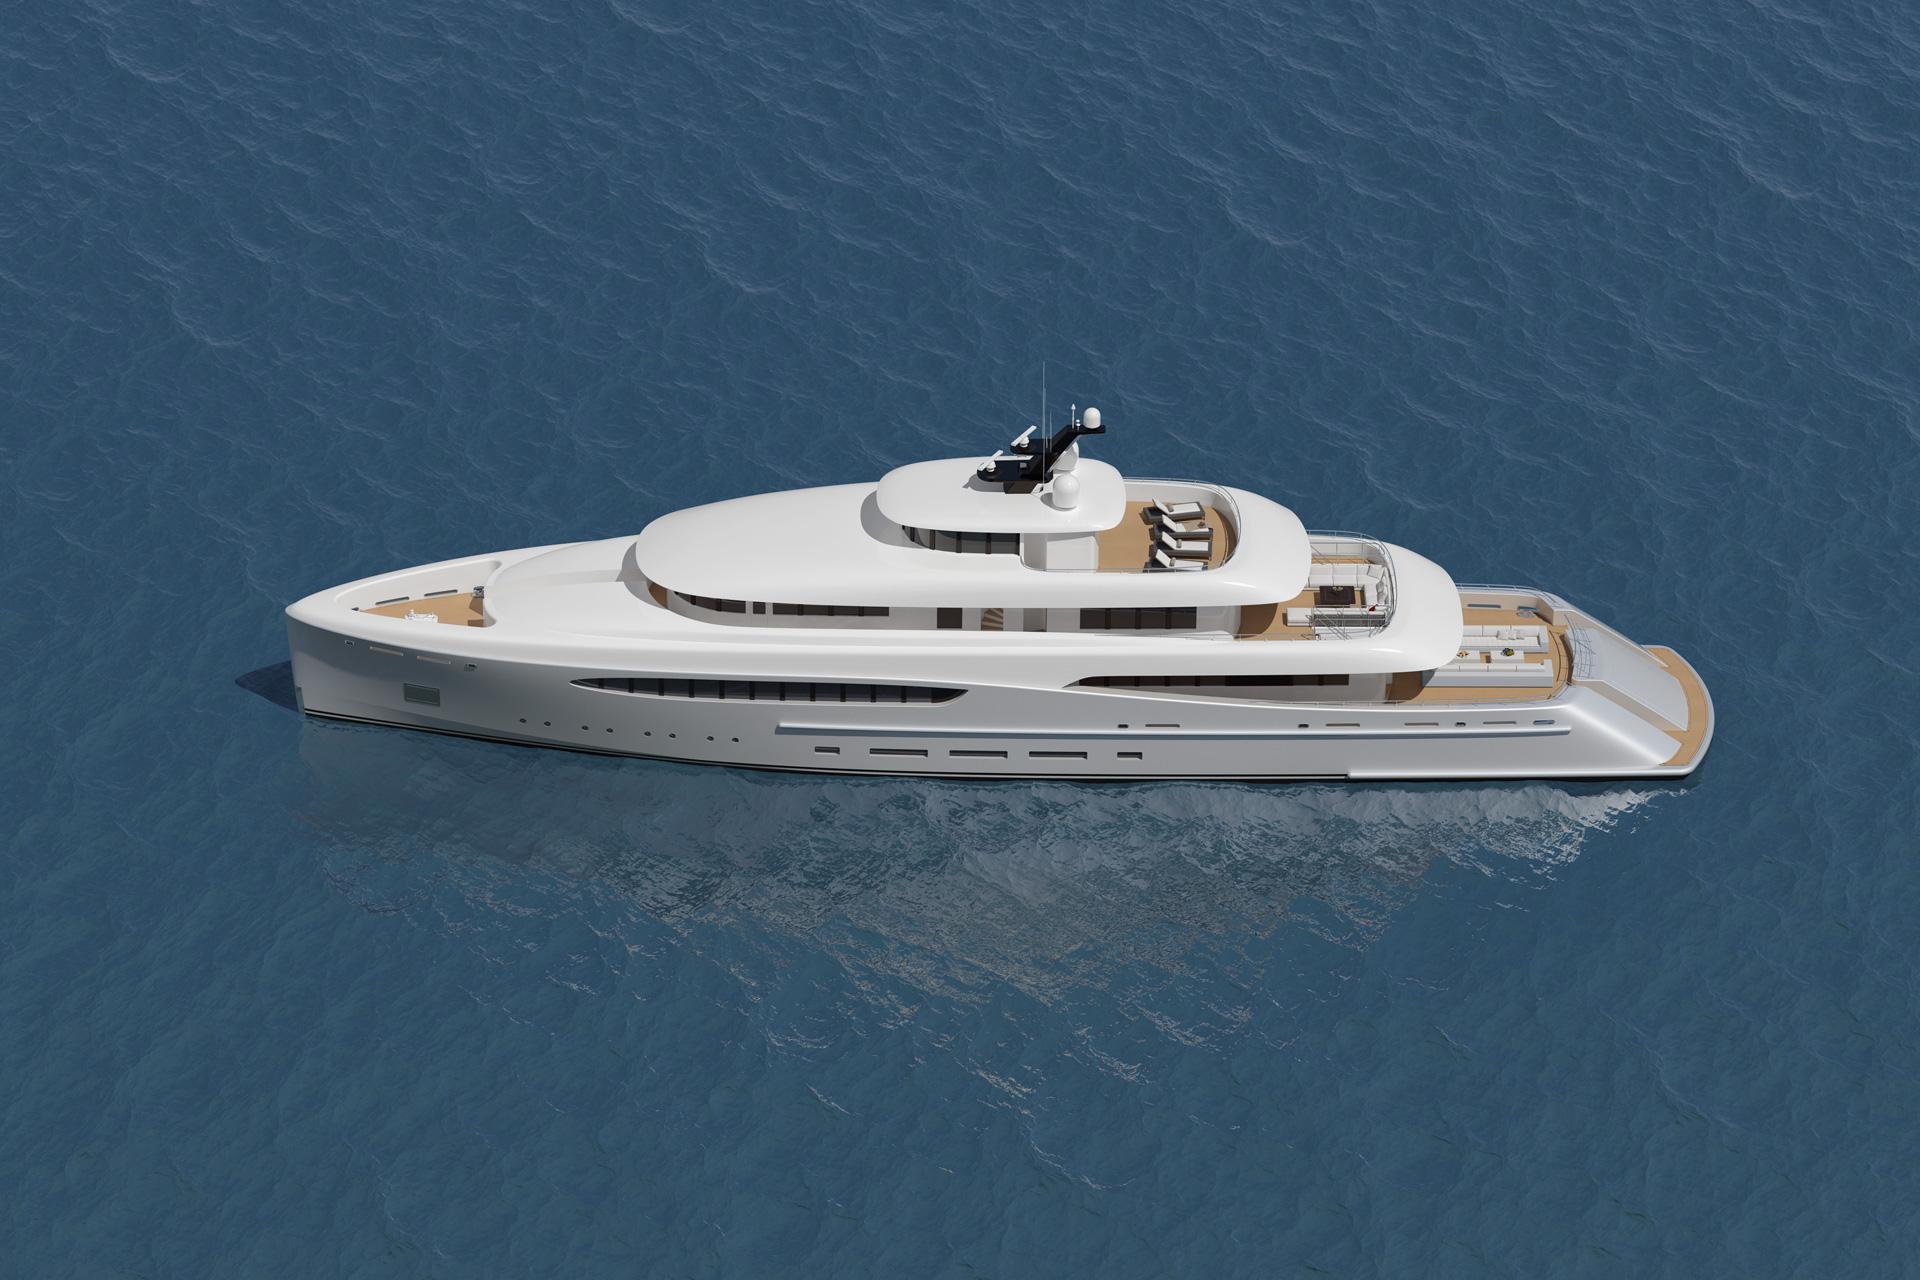 luxury superyacht overture by nick mezas yacht design luxury yacht